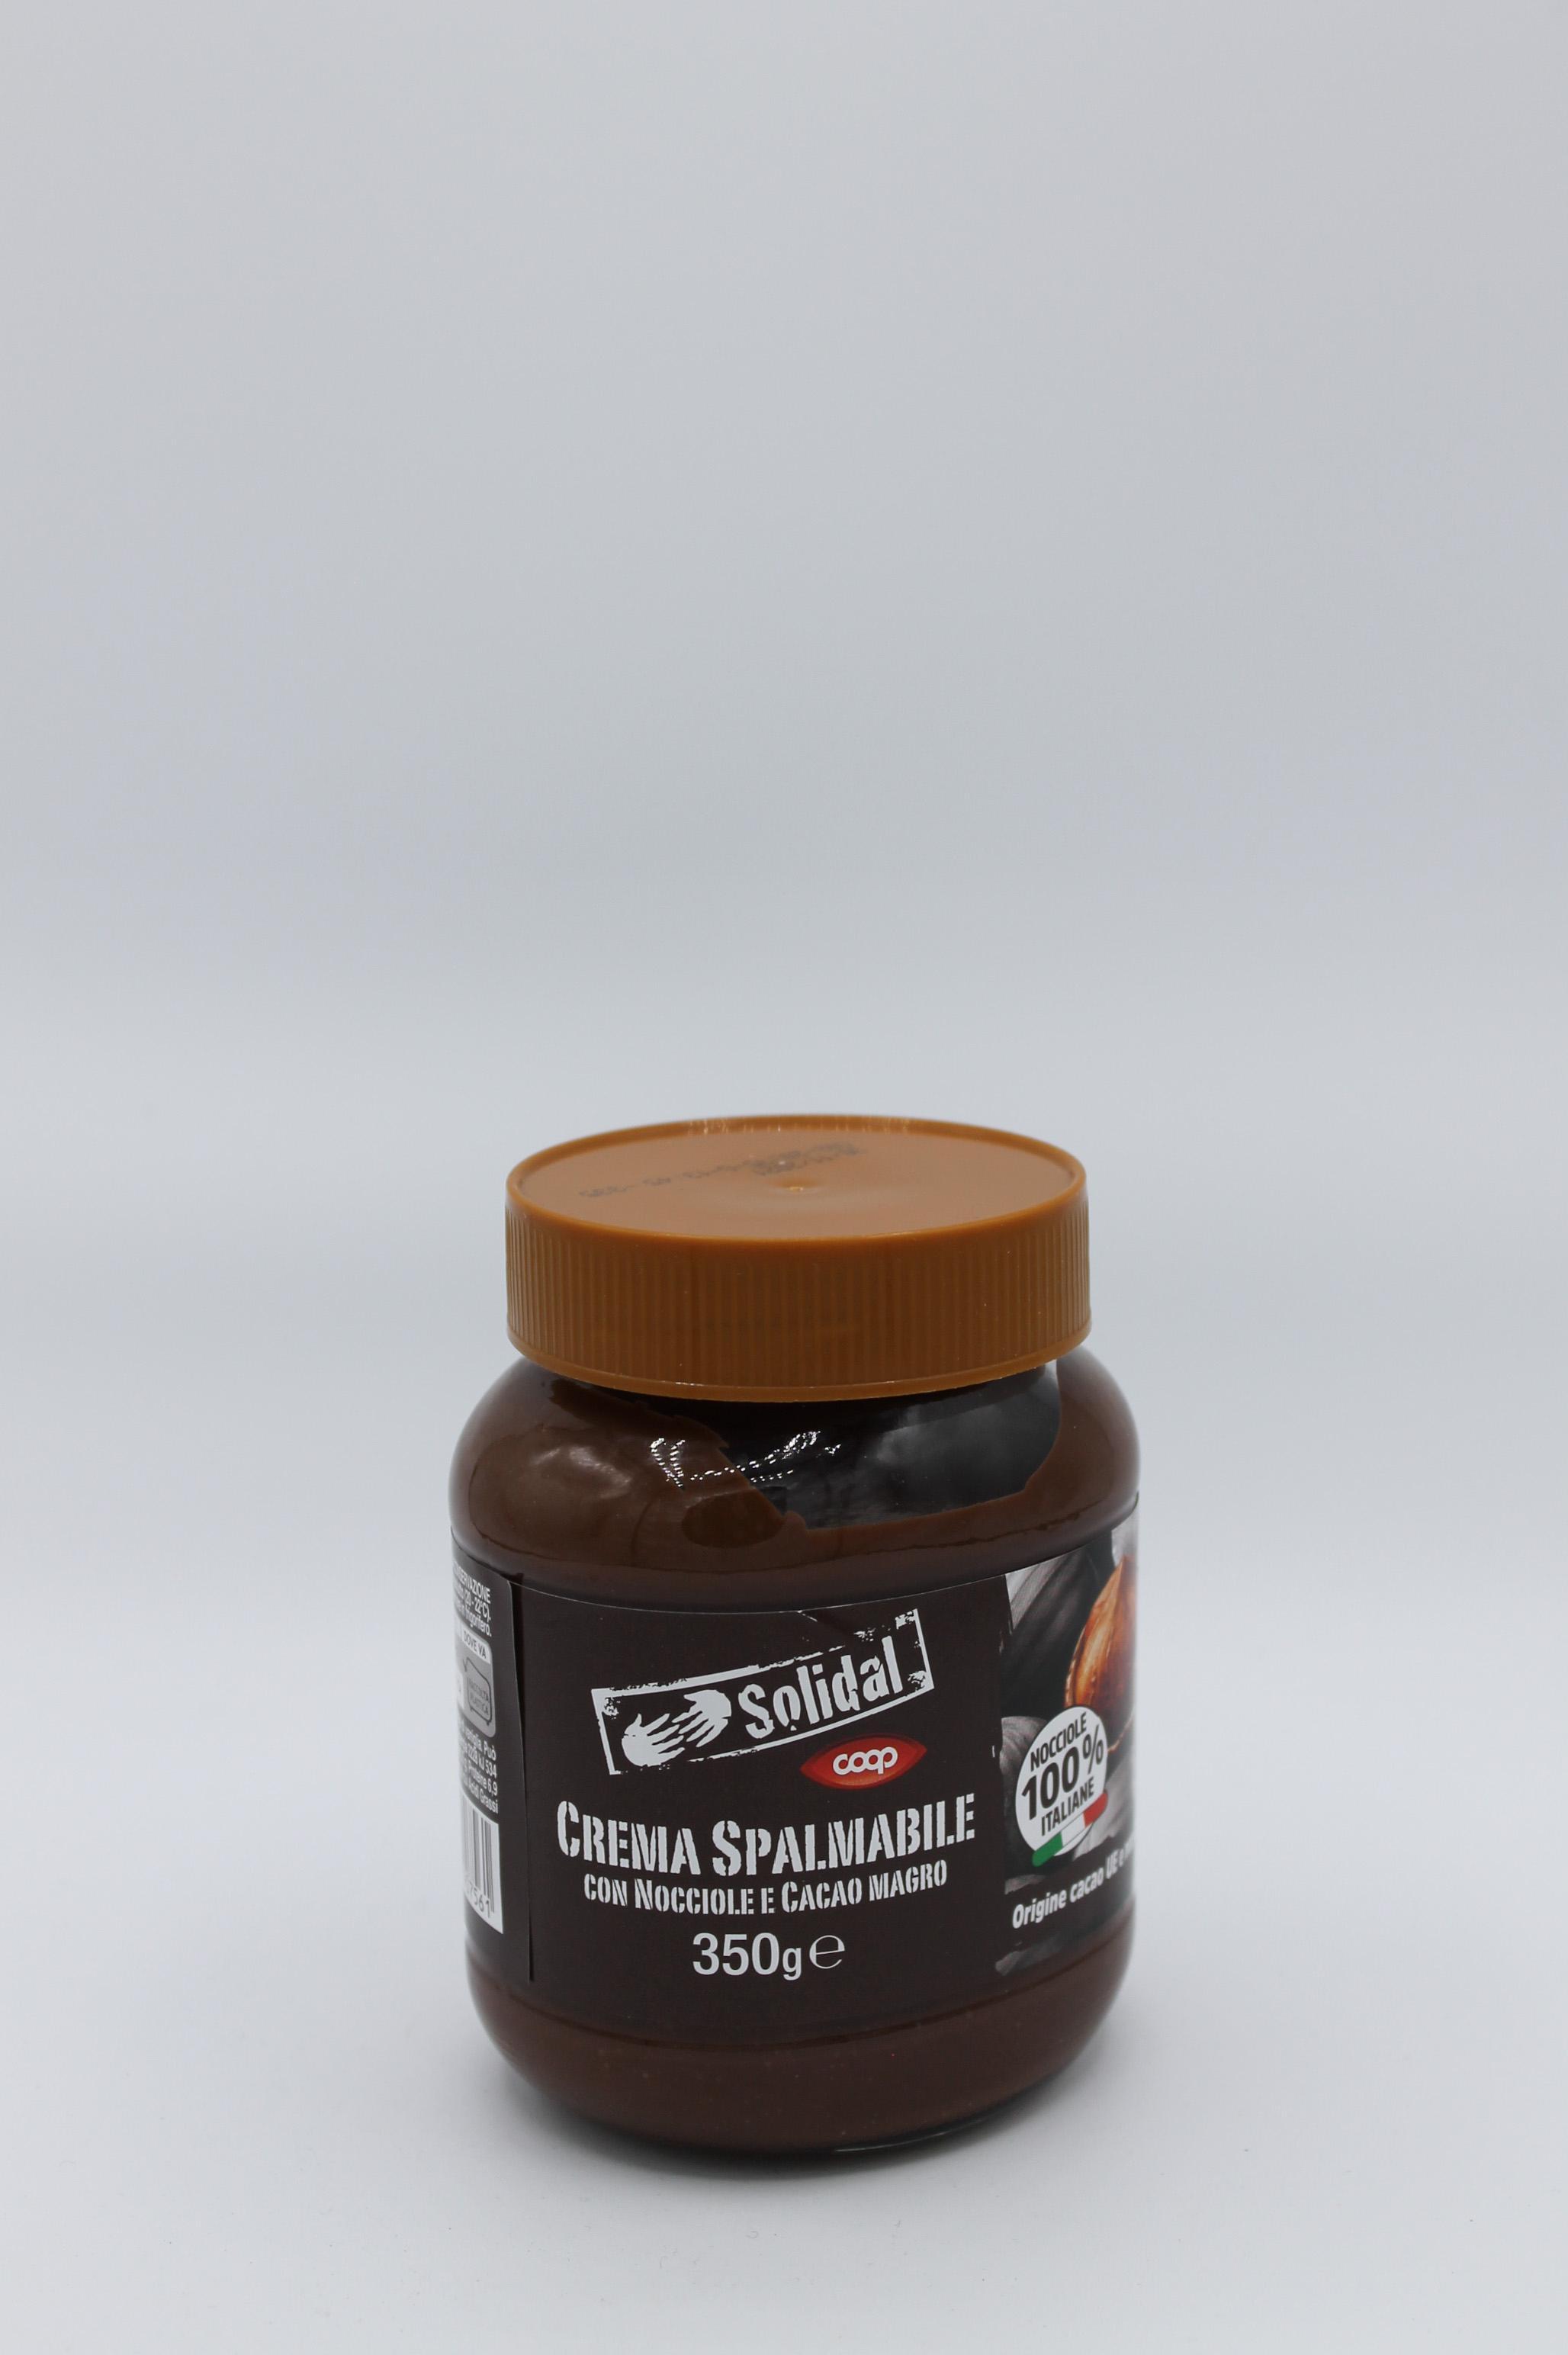 Coop crema spalmabile 350 gr.